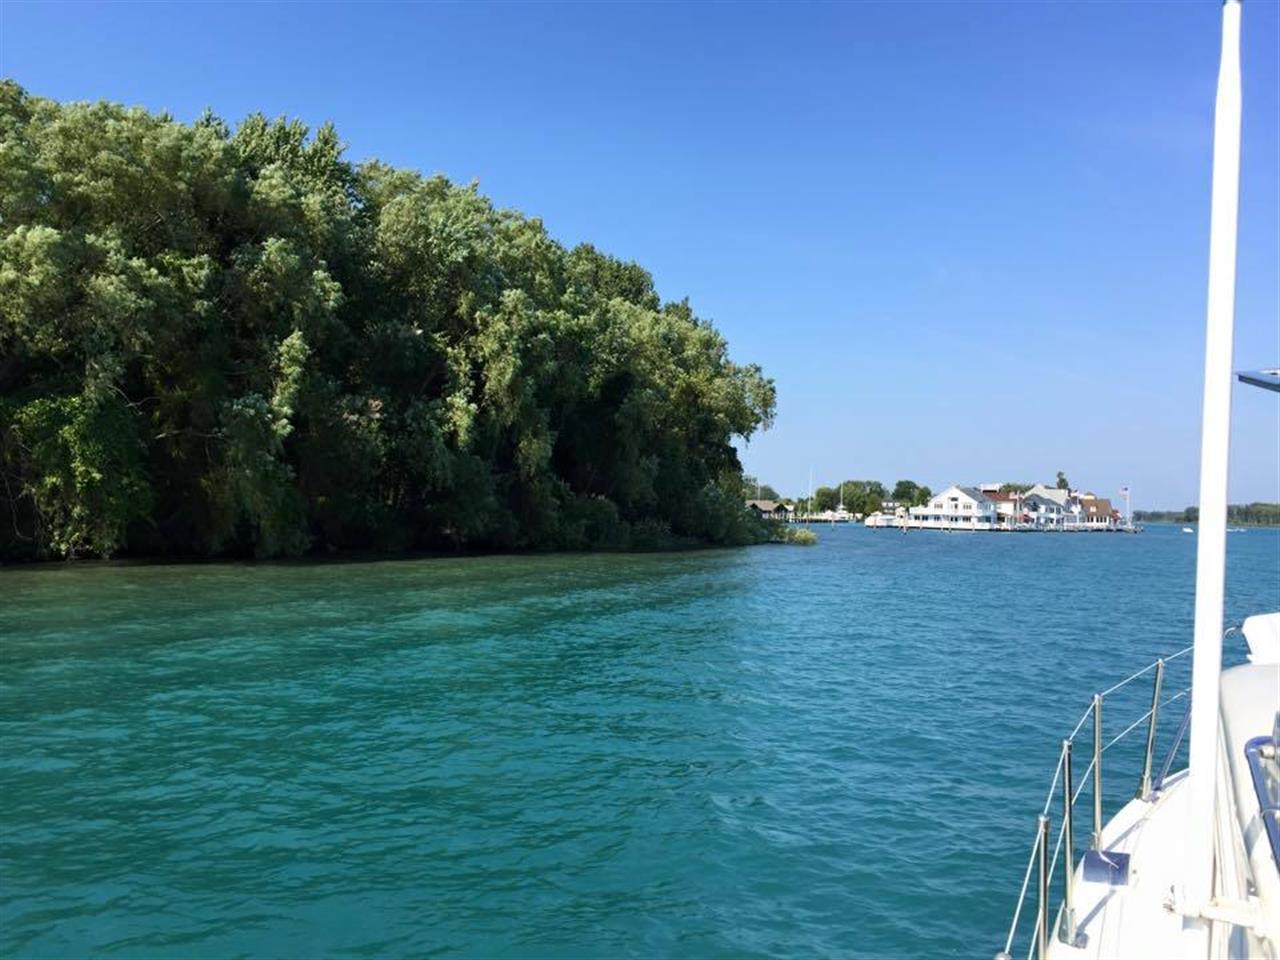 Harsens Island view from Lake St. Clair #Harsens Island #Michigan